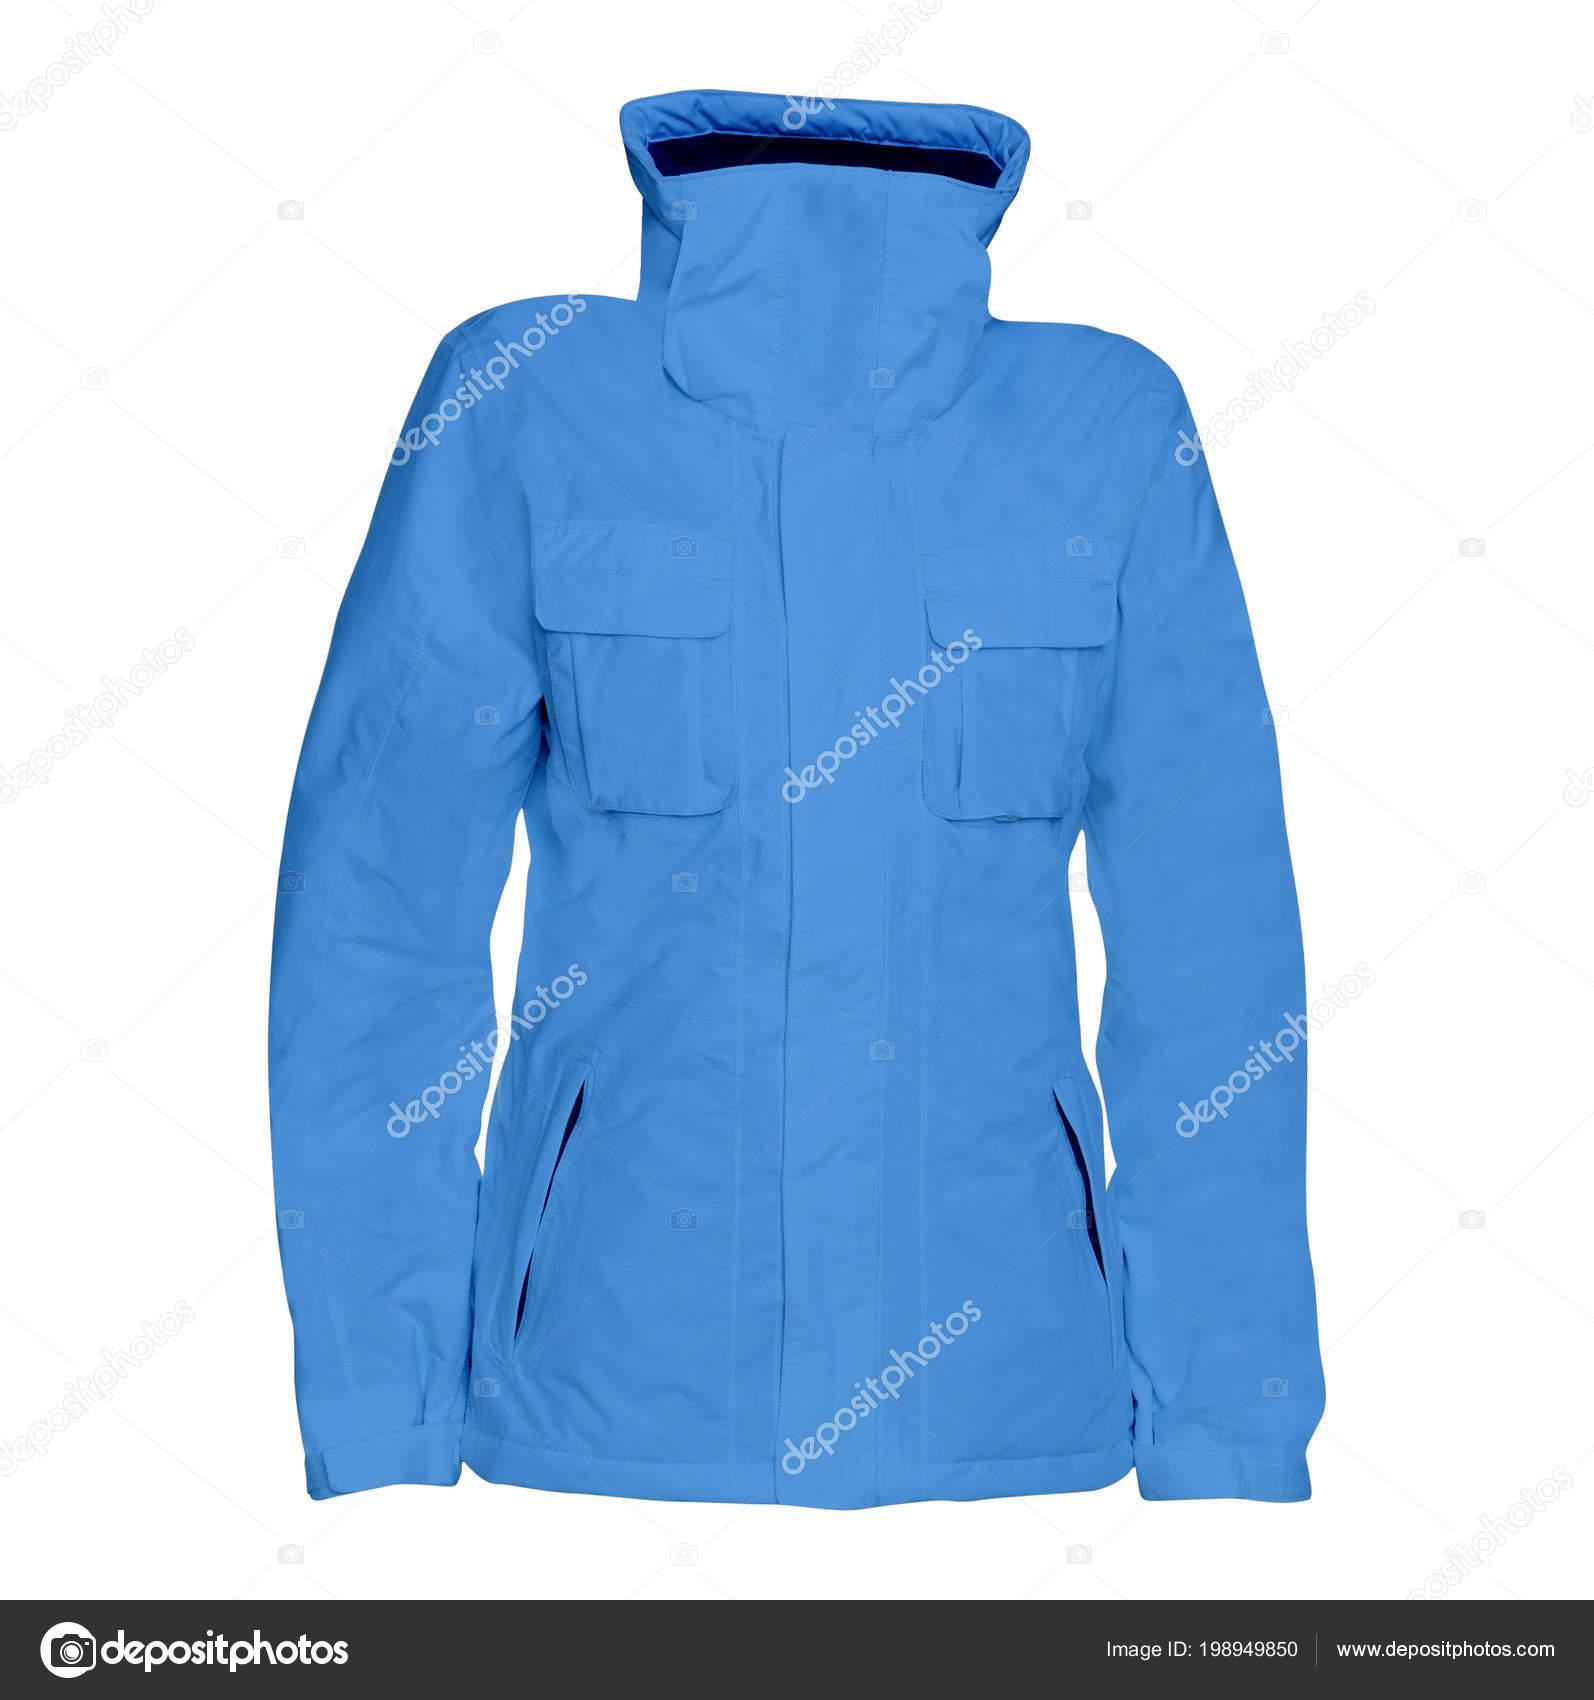 c49f5d0481d Μπλε Ανδρικό Χειμερινό Μπουφάν Που Απομονώνονται Λευκό Φόντο — Φωτογραφία  Αρχείου